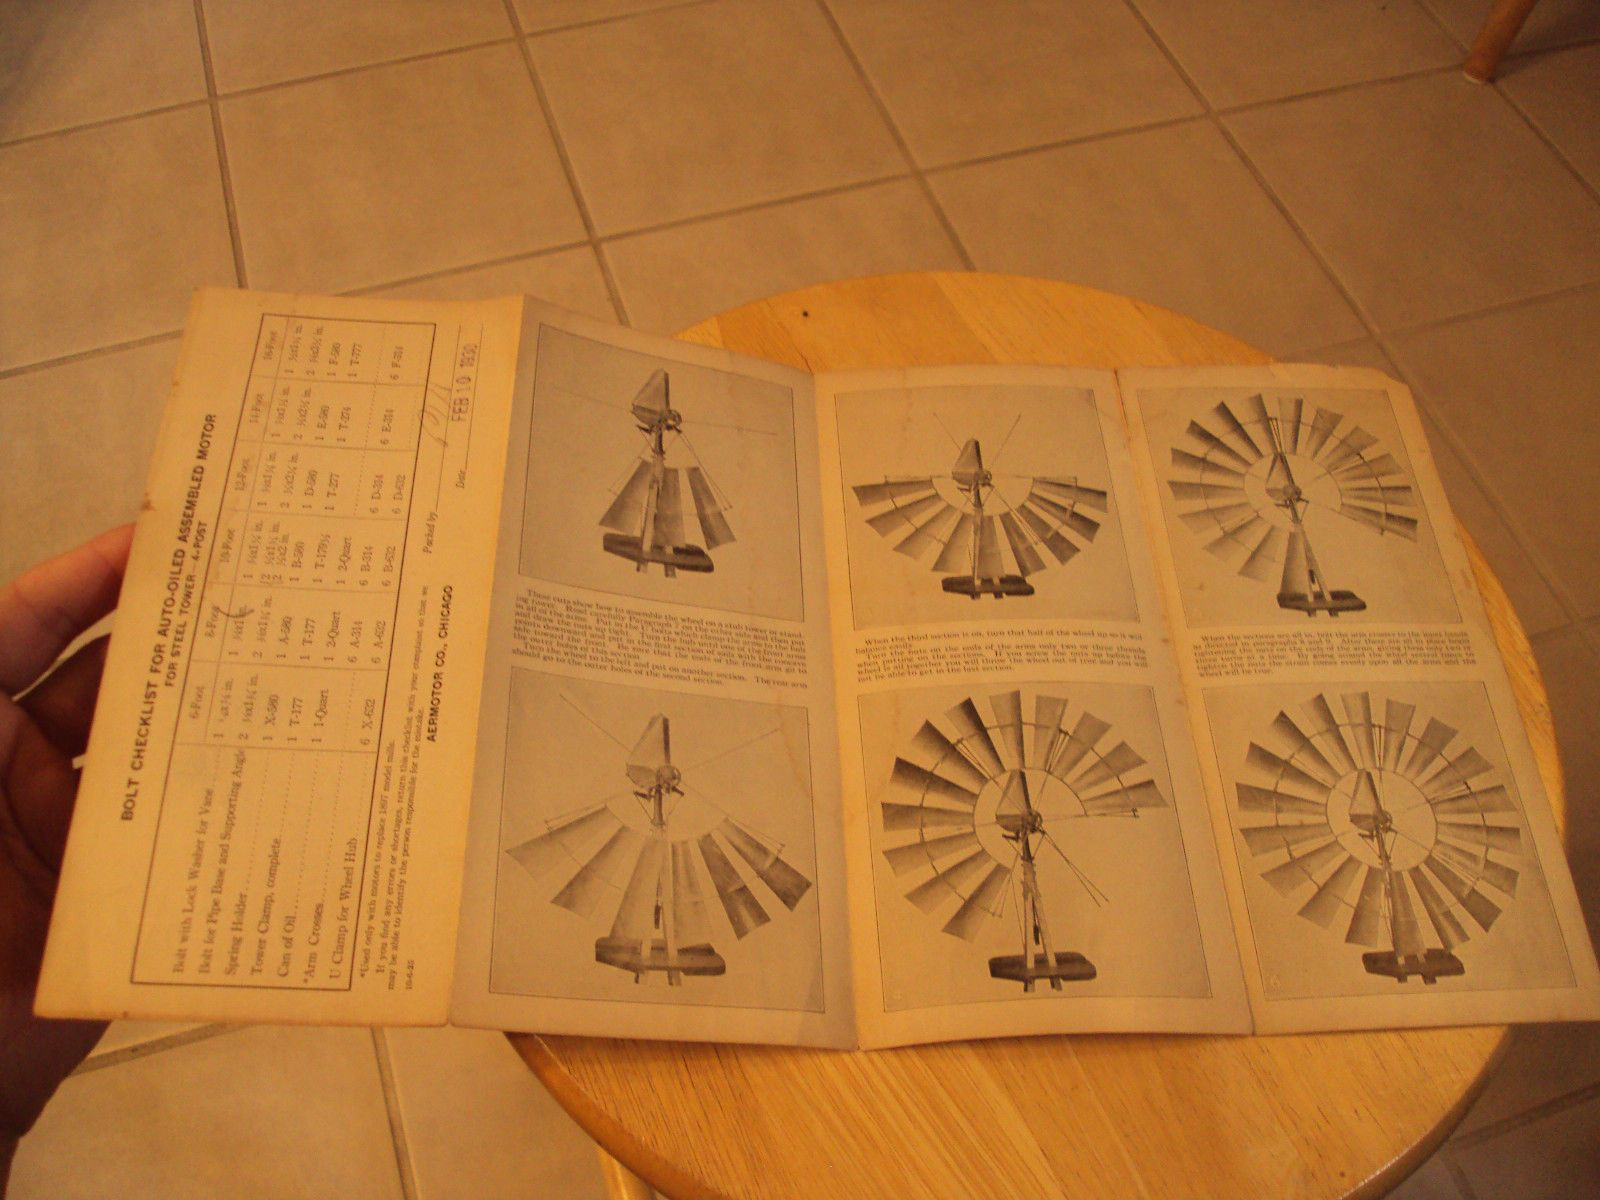 rare 1930 assembly instructions the aermotor windmill company ephemera paper ebay [ 1600 x 1200 Pixel ]